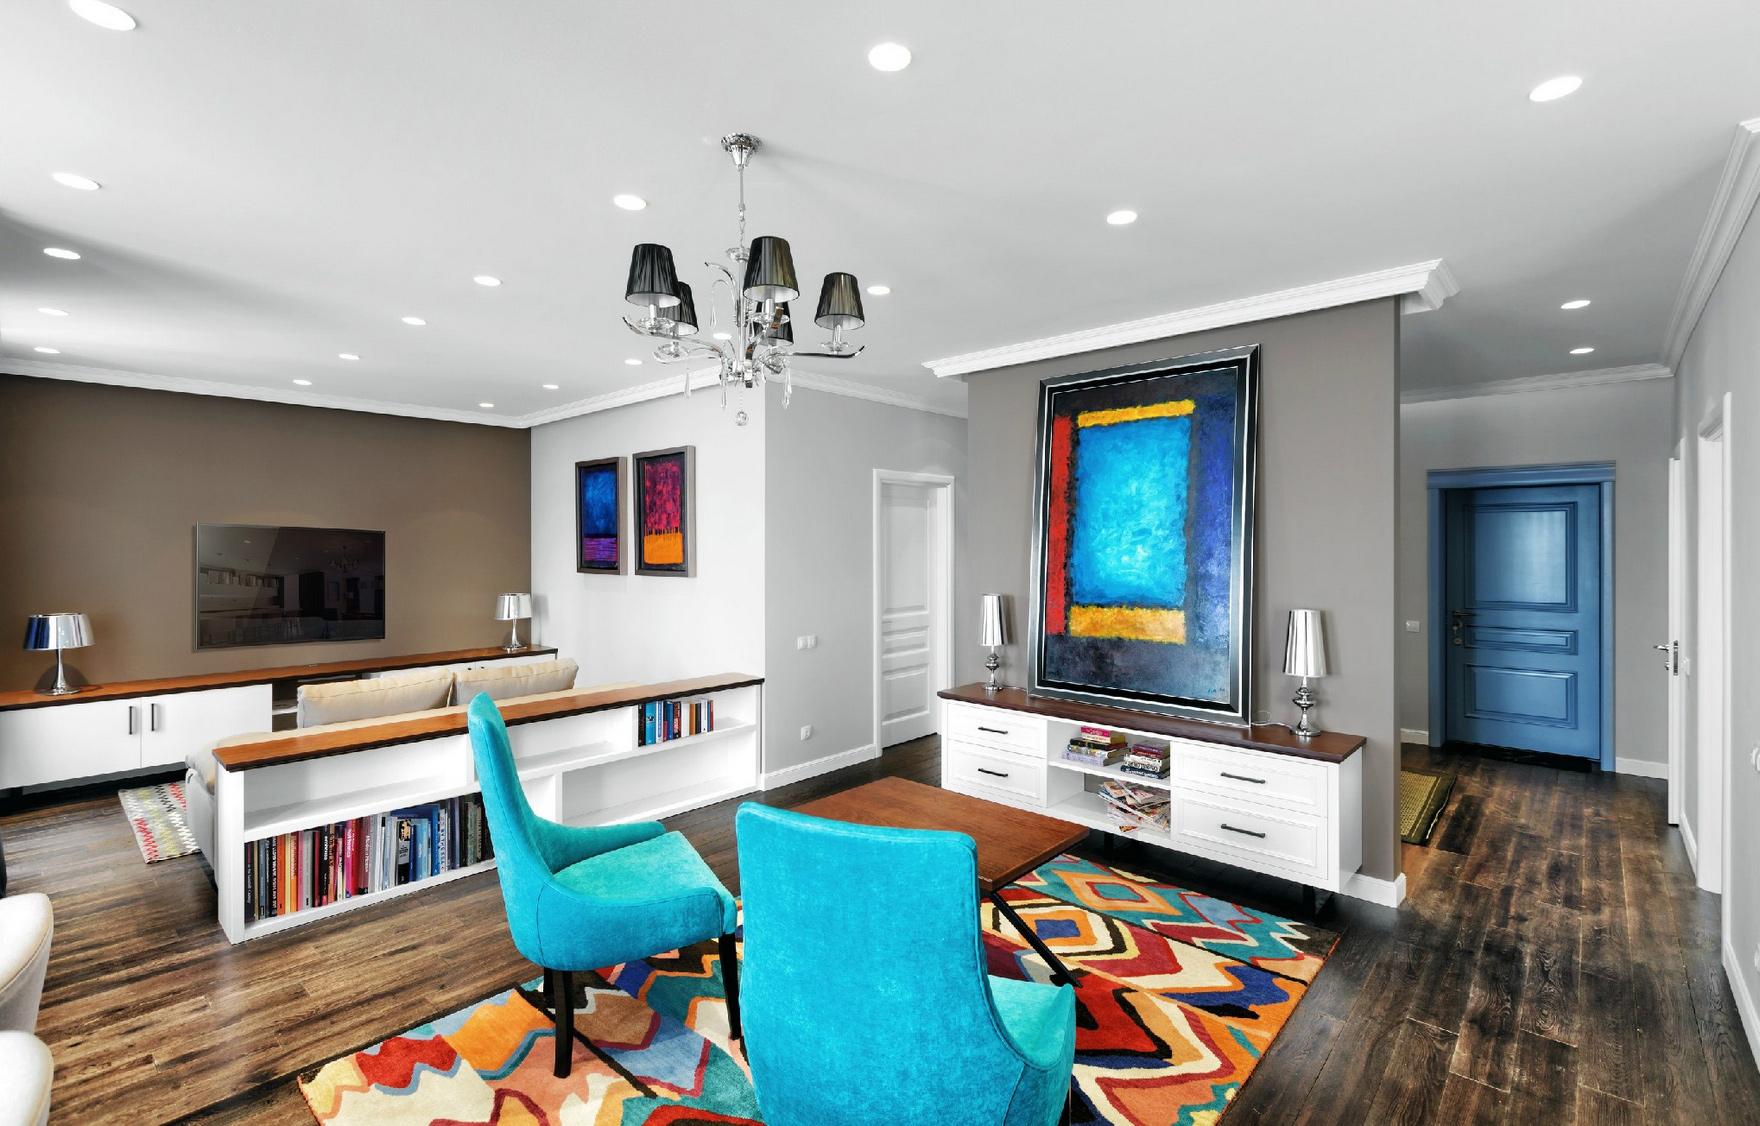 Kitsch Interior Design Style , Small Design Ideas